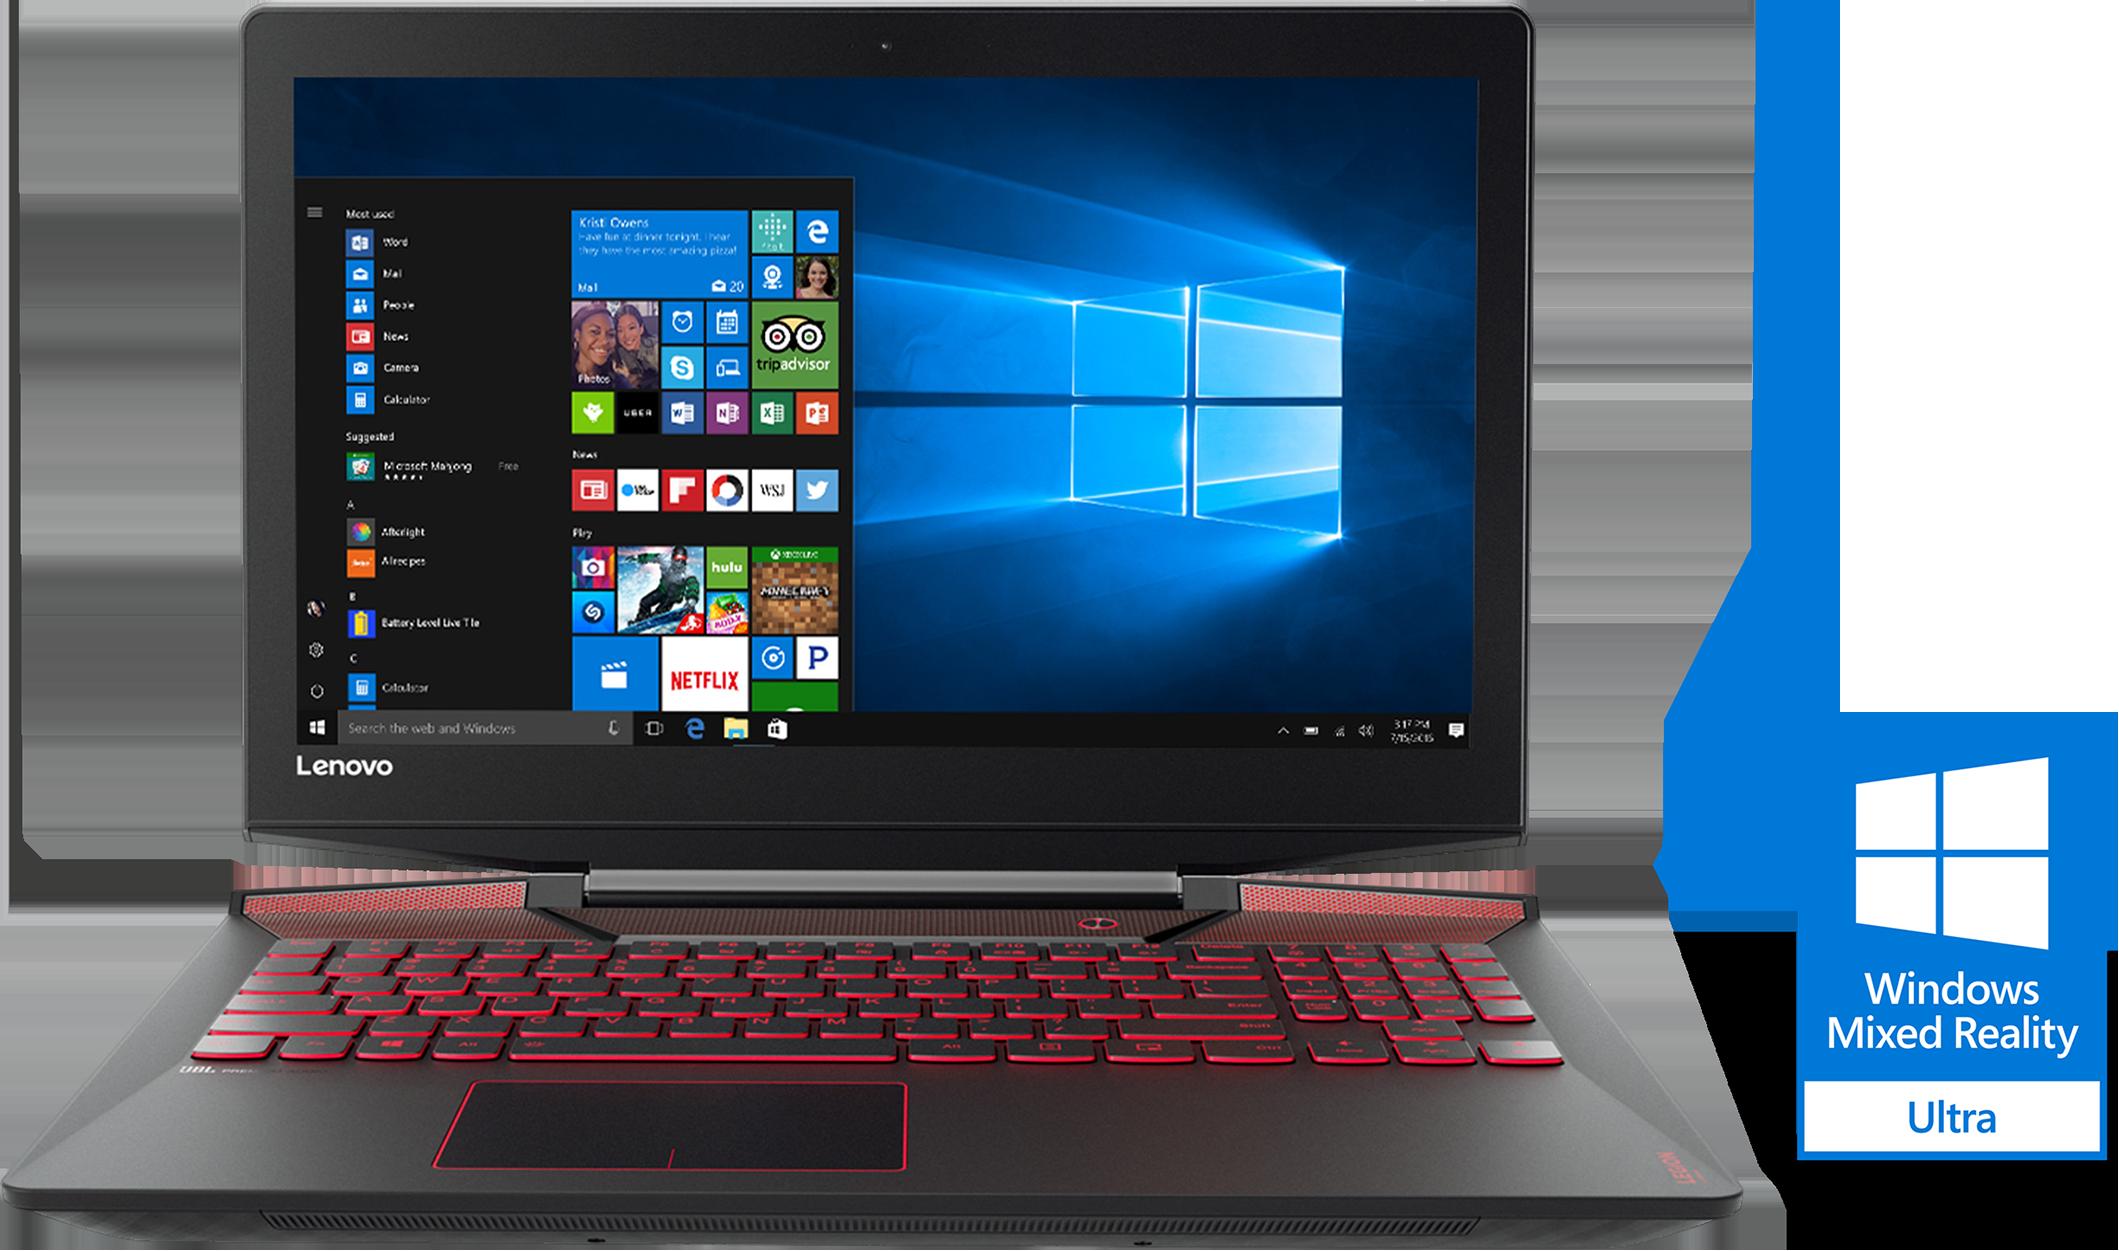 Lenovo Legion Y720 80VR0064US Gaming Laptop